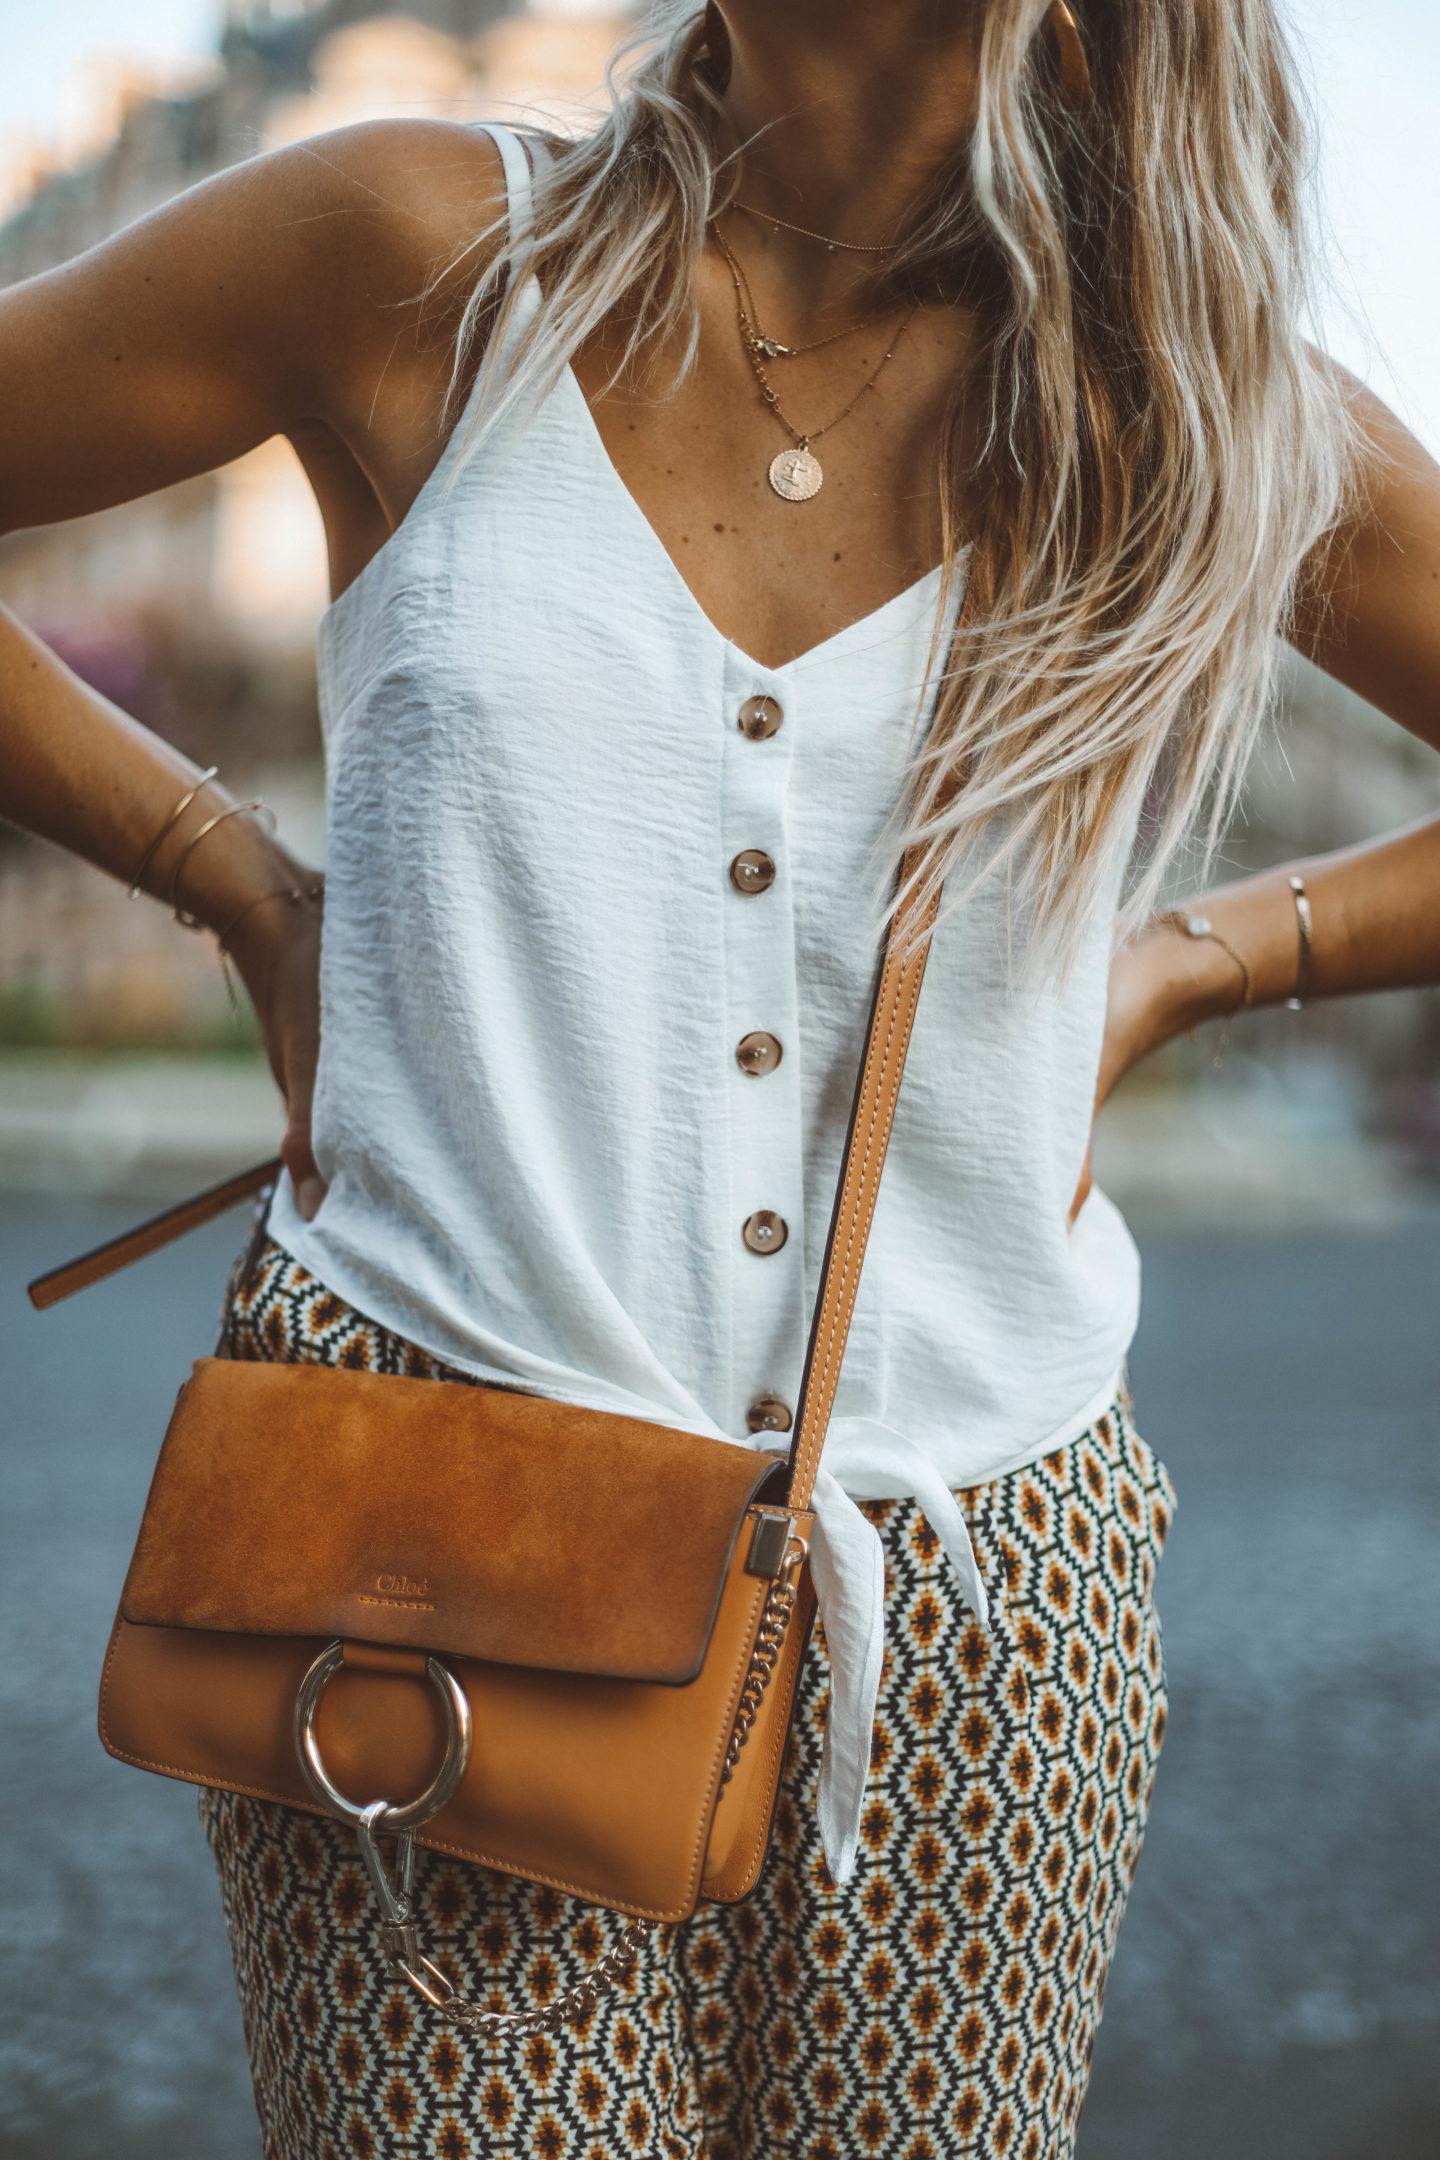 Bijoux Lou.Yetu - Blondie Baby blog mode Paris et voyages